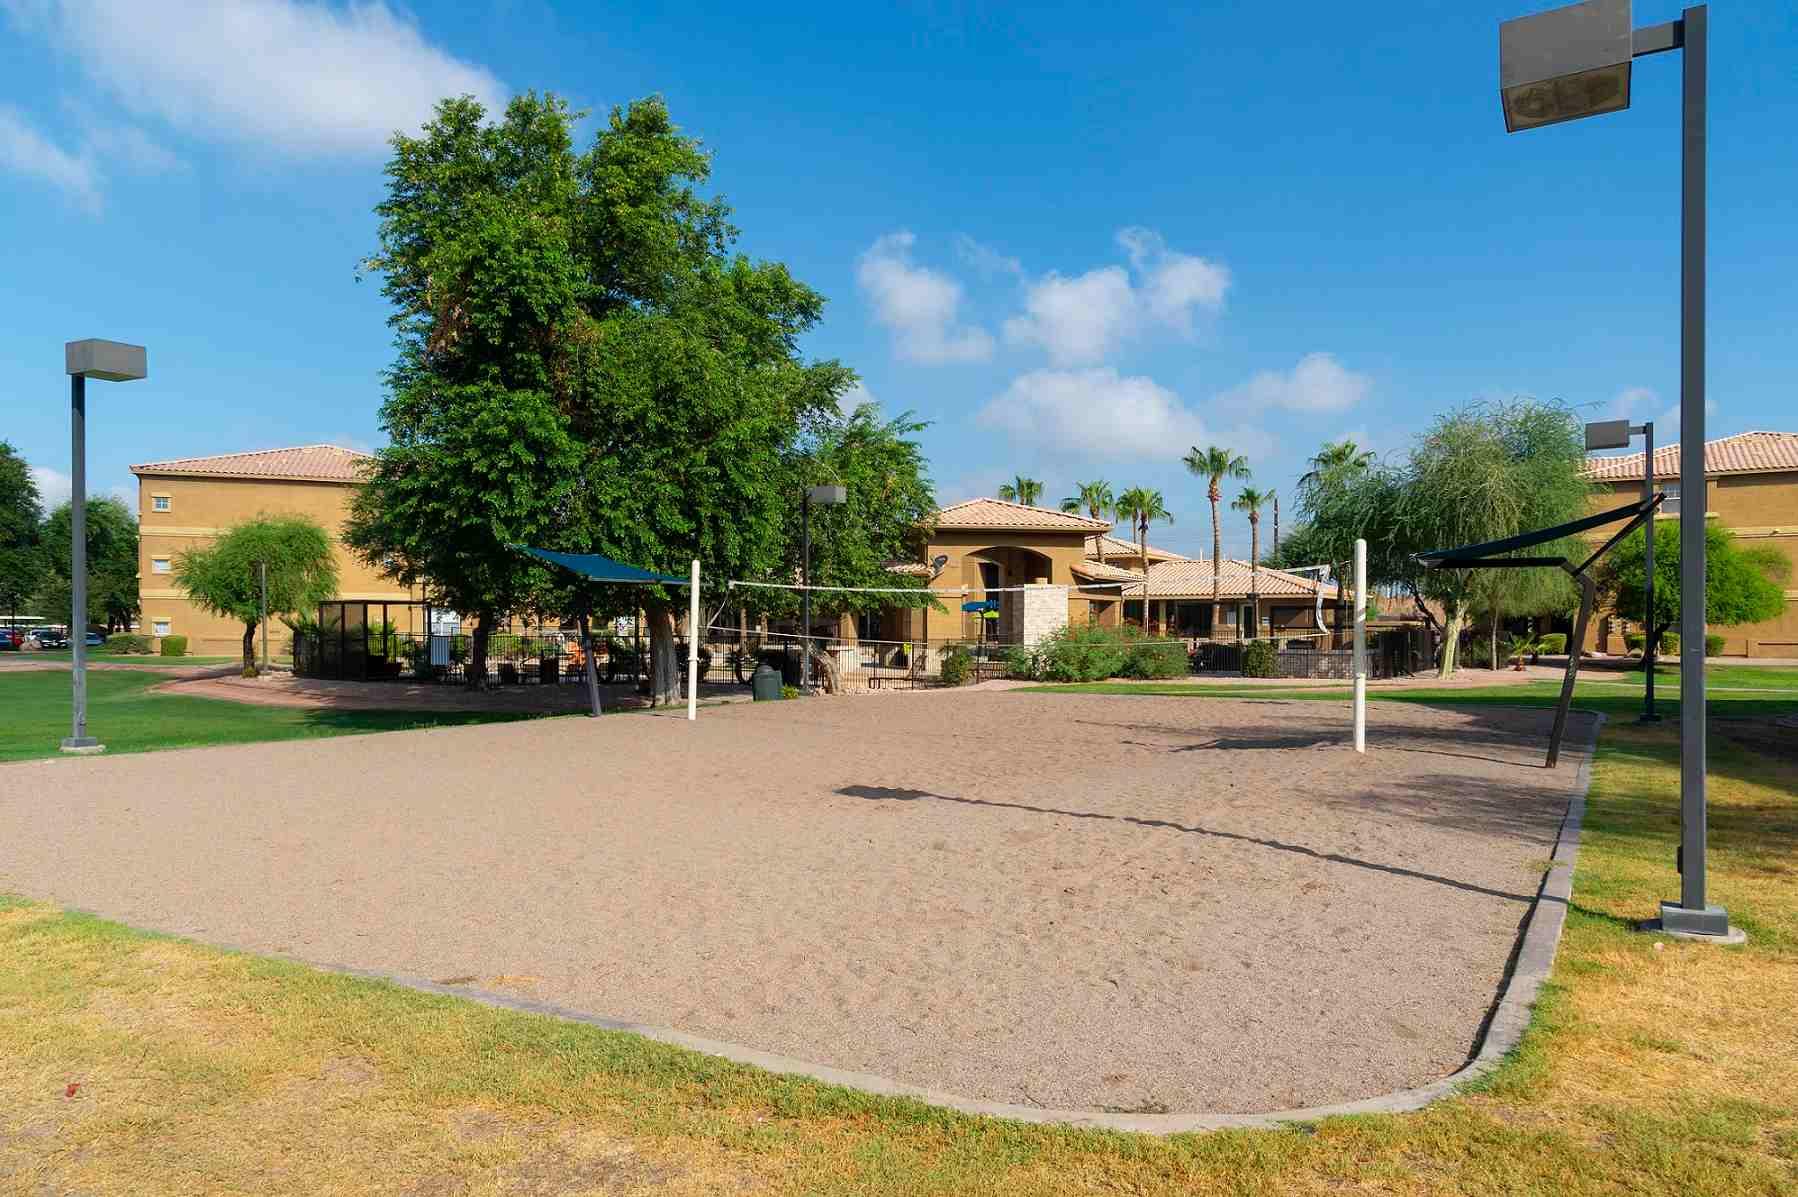 Gateway-At-Tempe-AZ-Volleyball-Court-Unilodgers